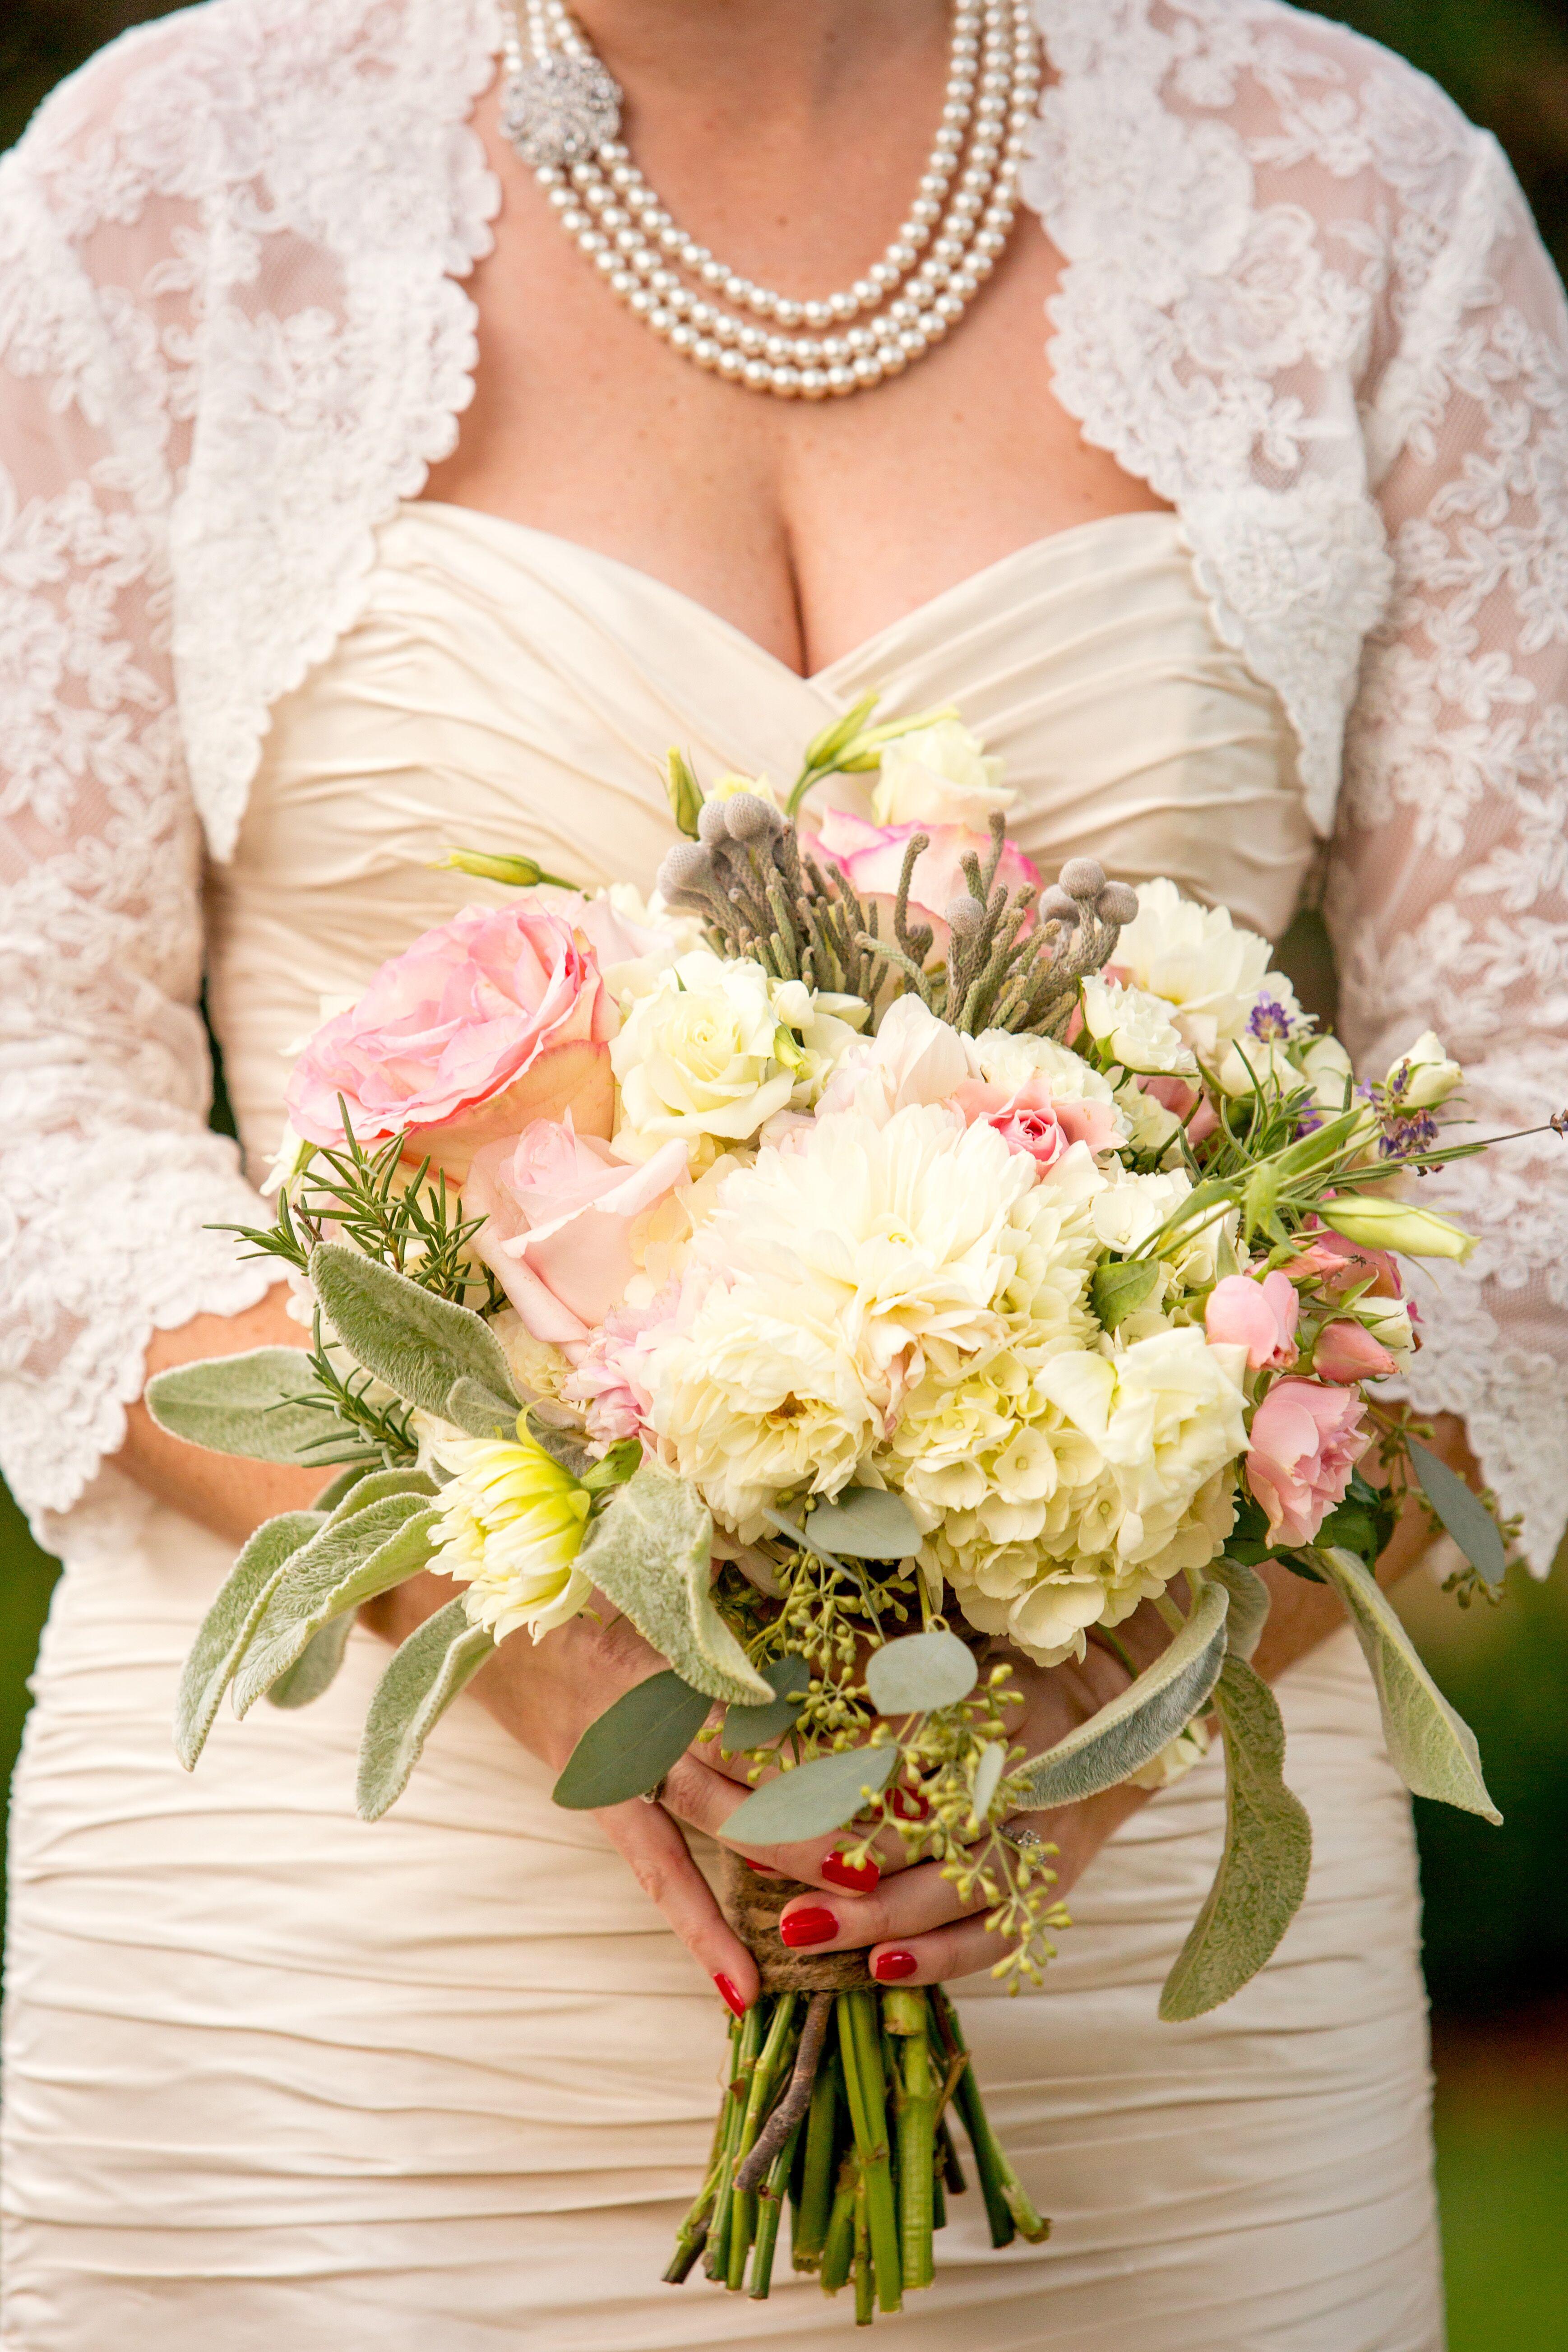 Elegant Textured White And Blush Bridal Bouquet